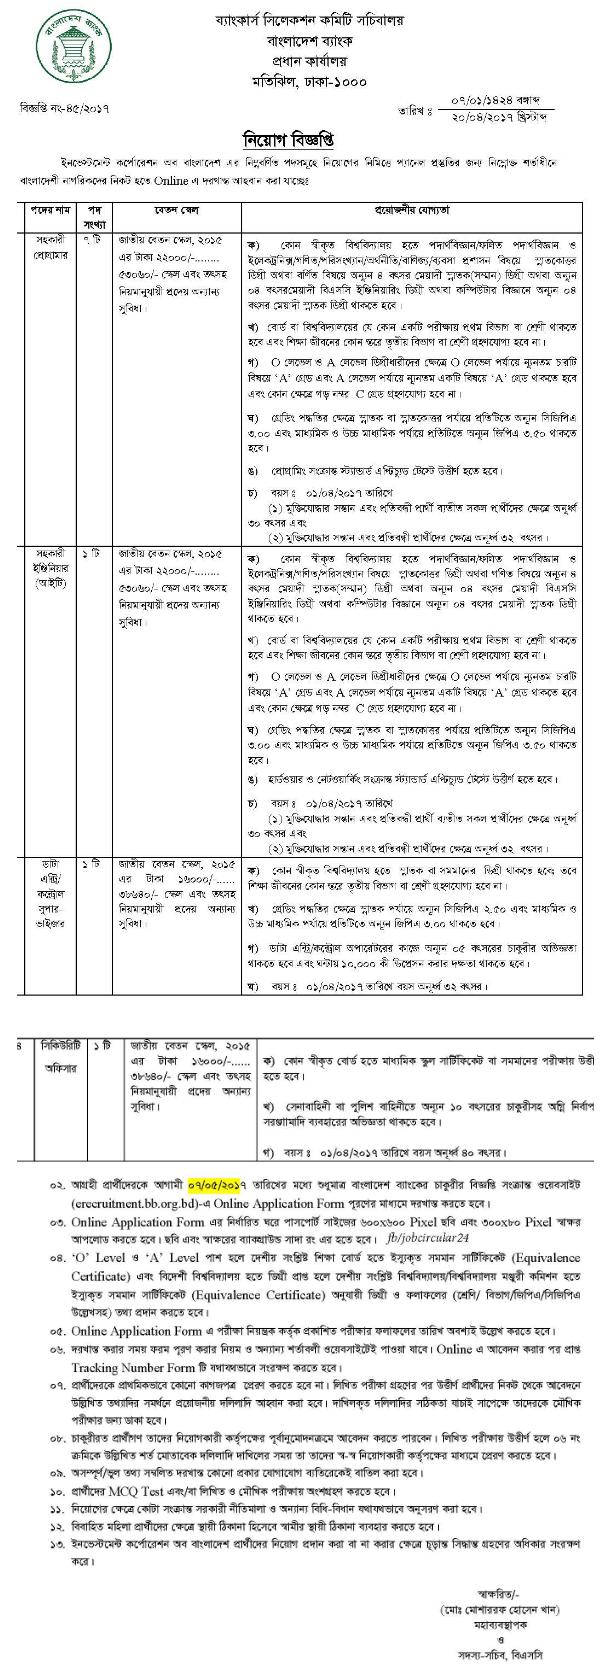 Bangladesh bank job application form - bangladesh bank job ...